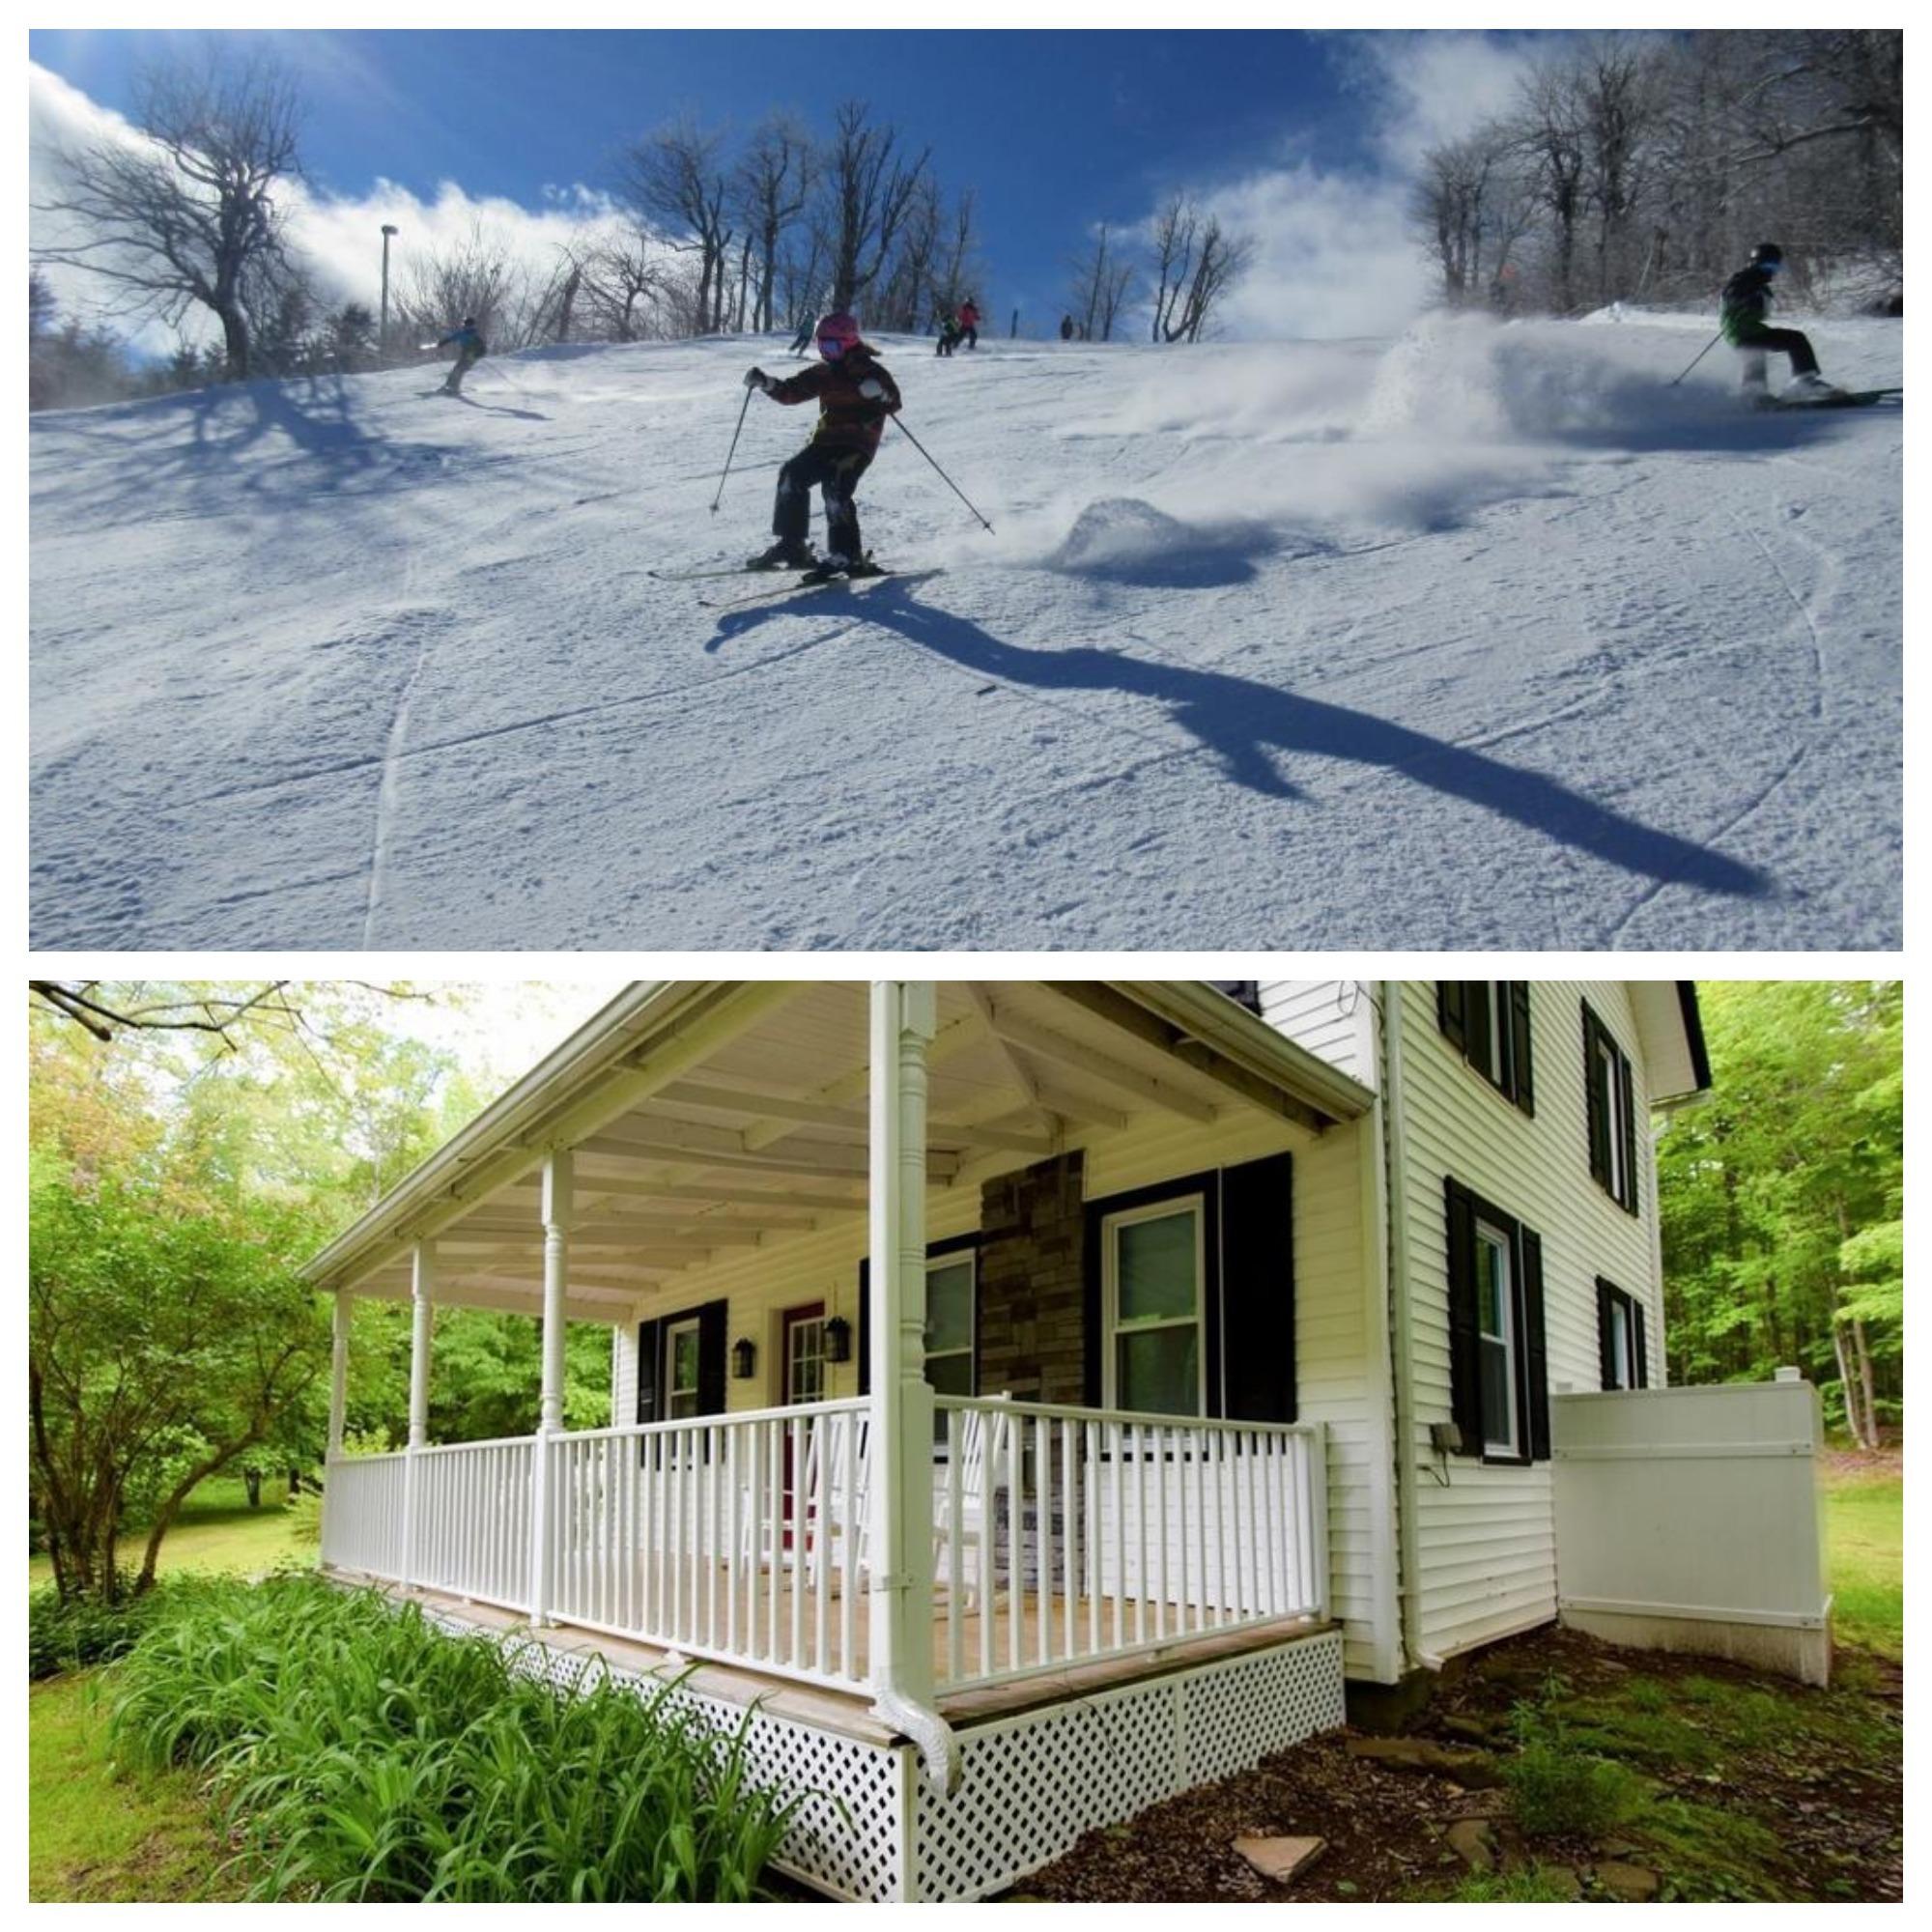 Hudson Valley Catskills slopes